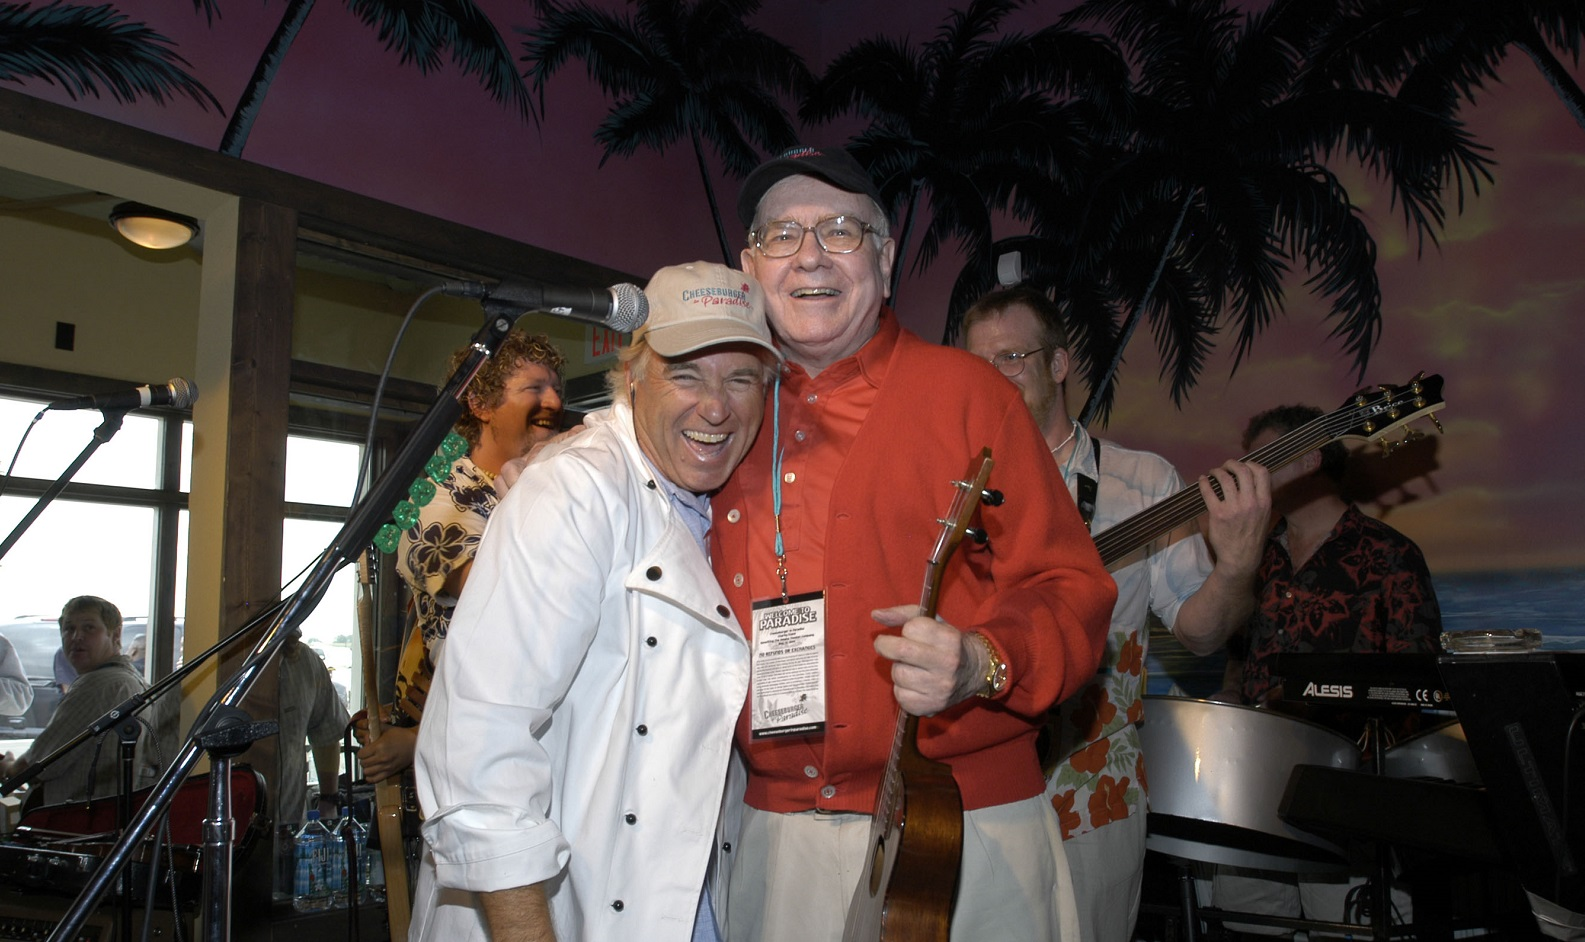 Jimmy Buffett can't believe he got away with it either – The Buffalo News